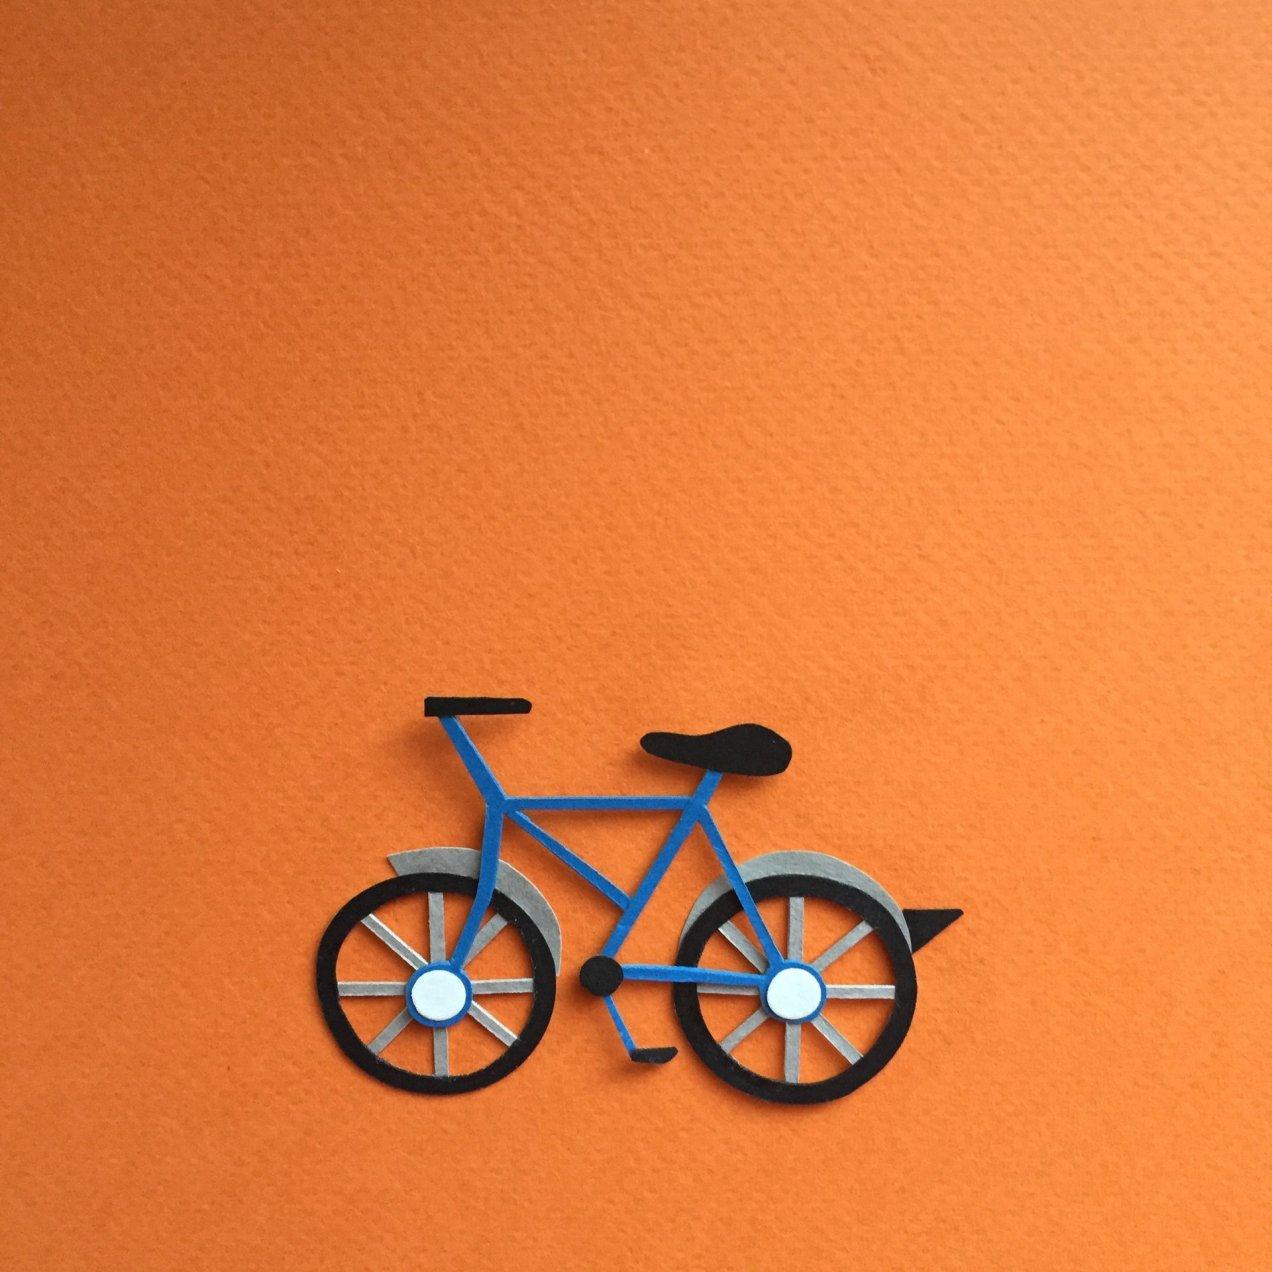 Paper emoji - bike